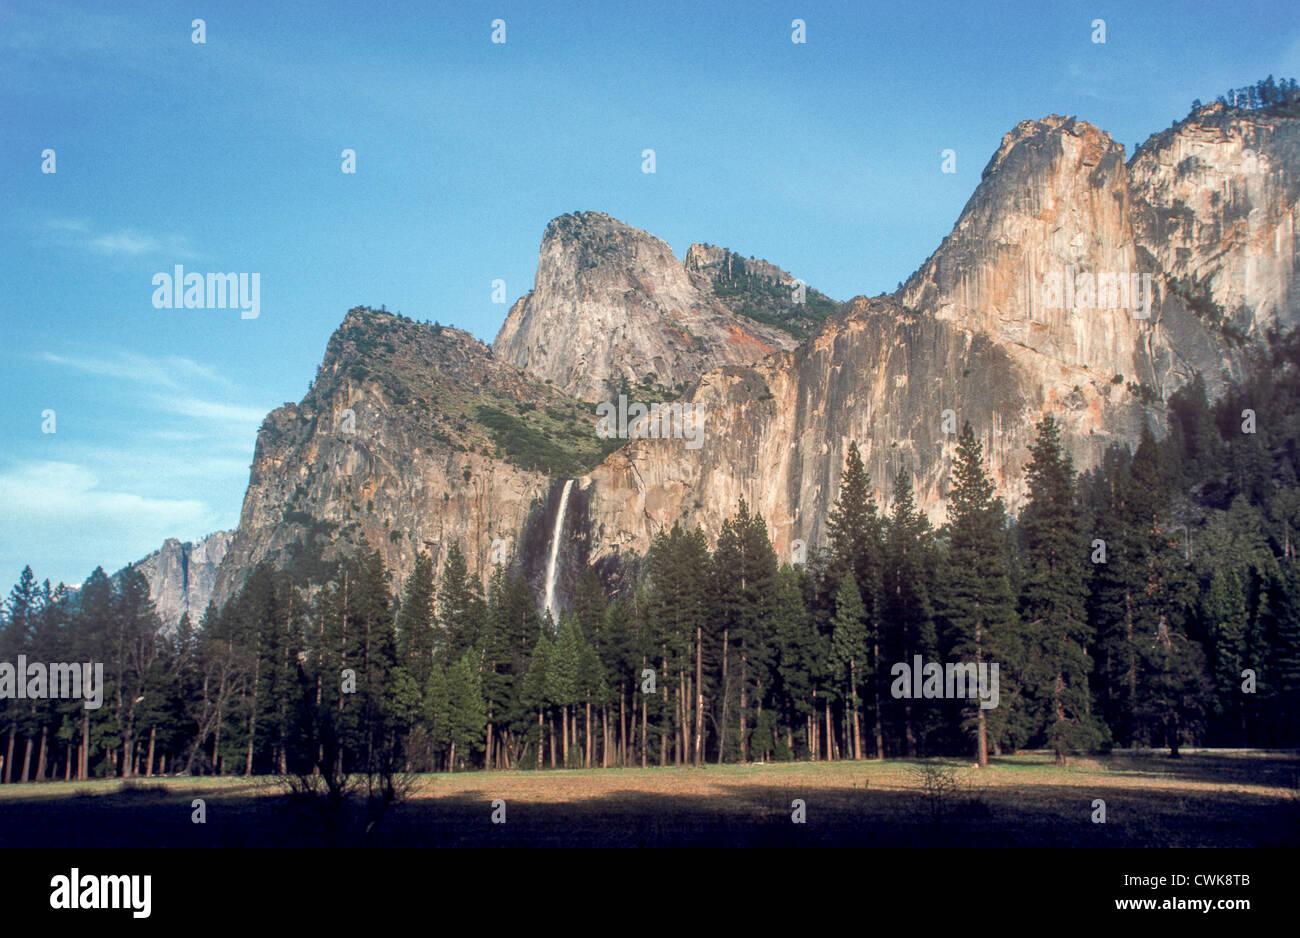 Une vue de Bridalveil Fall in Yosemite National Park, California, USA. Banque D'Images